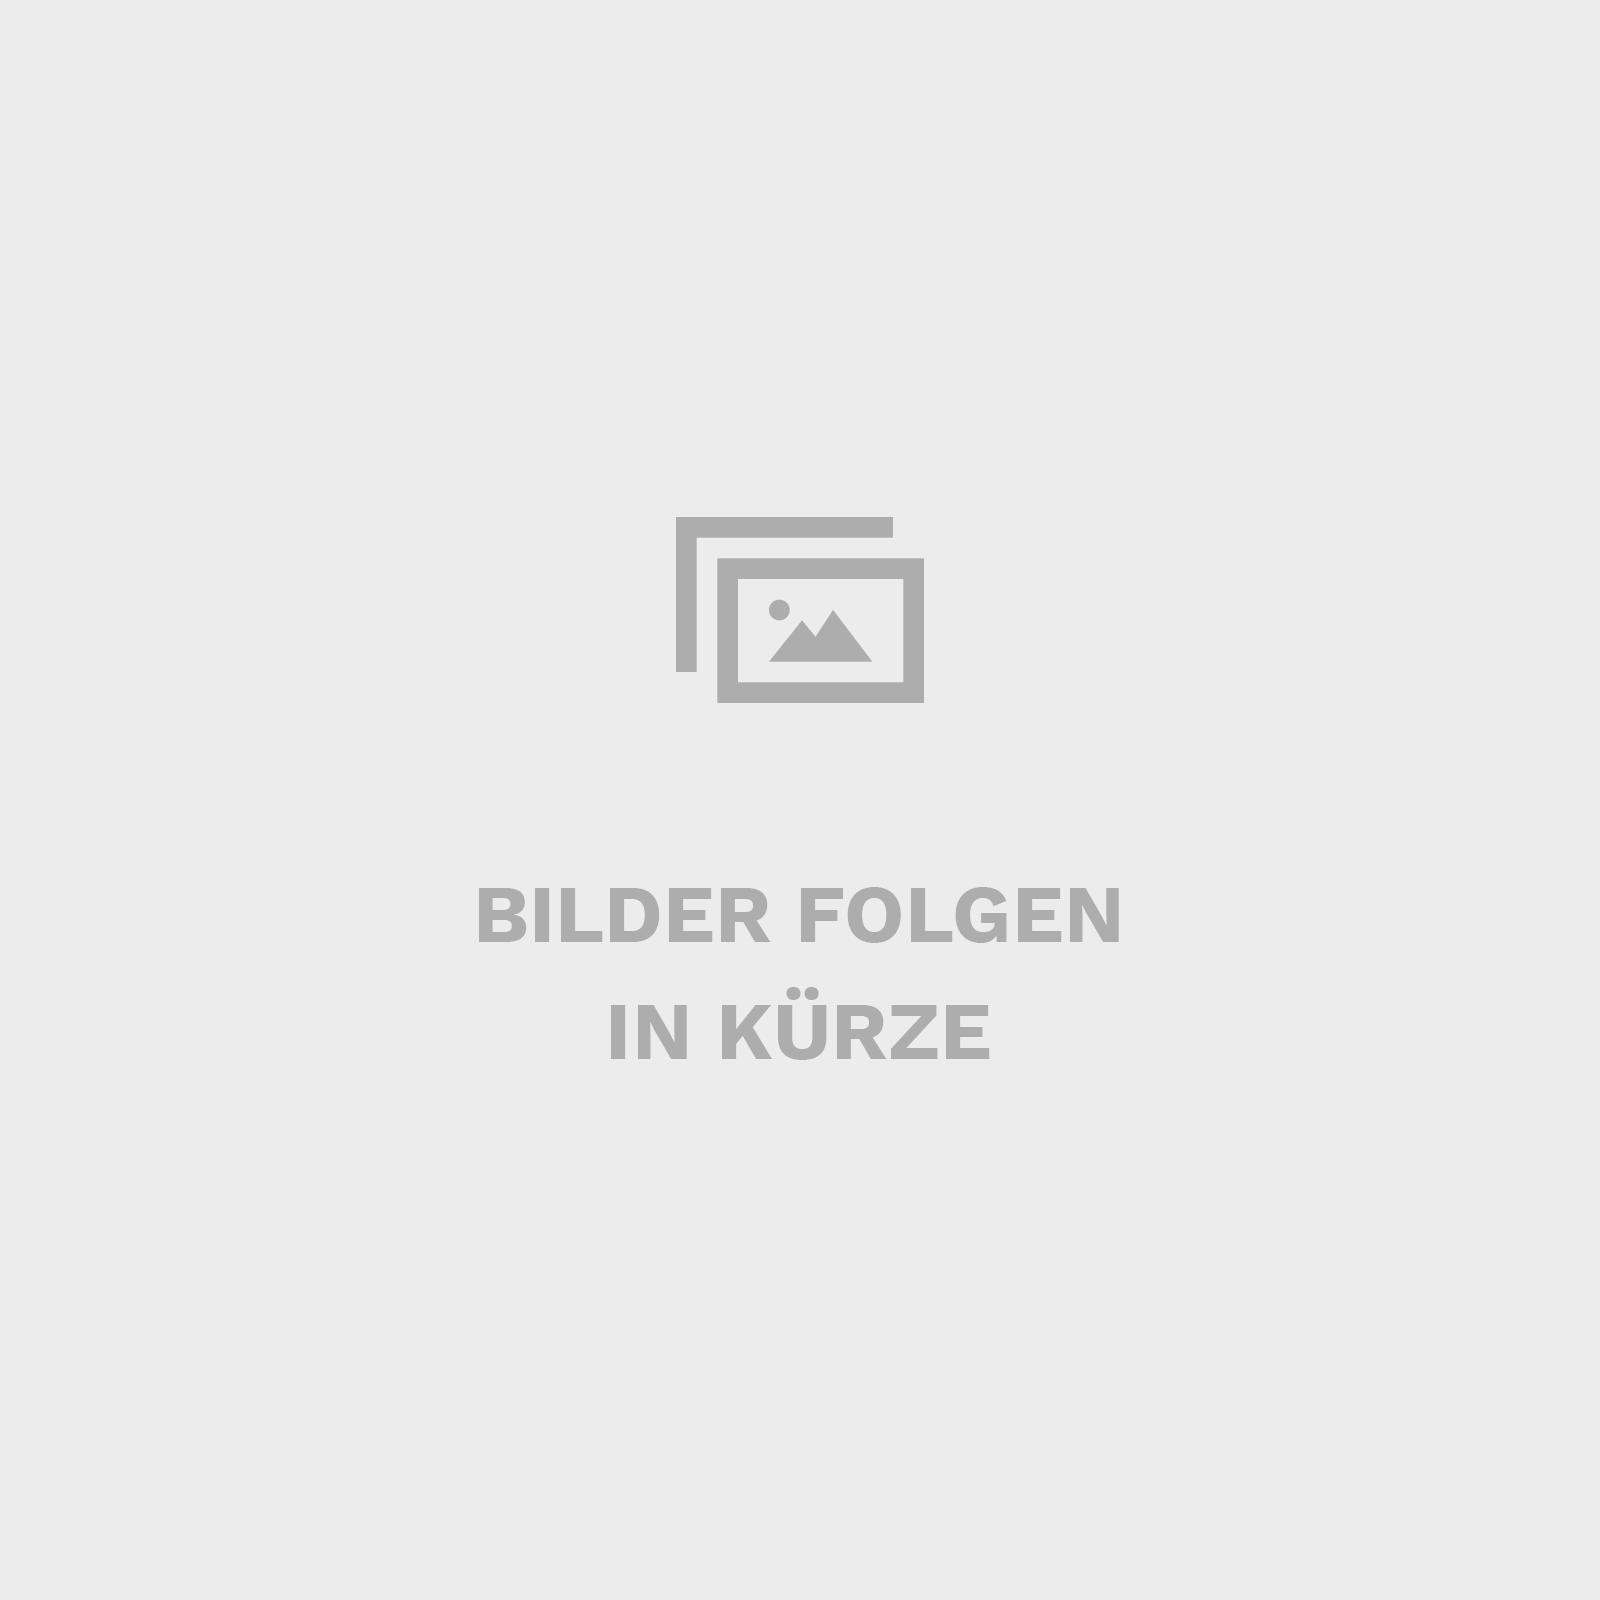 Farbe 02 - weiß/grau